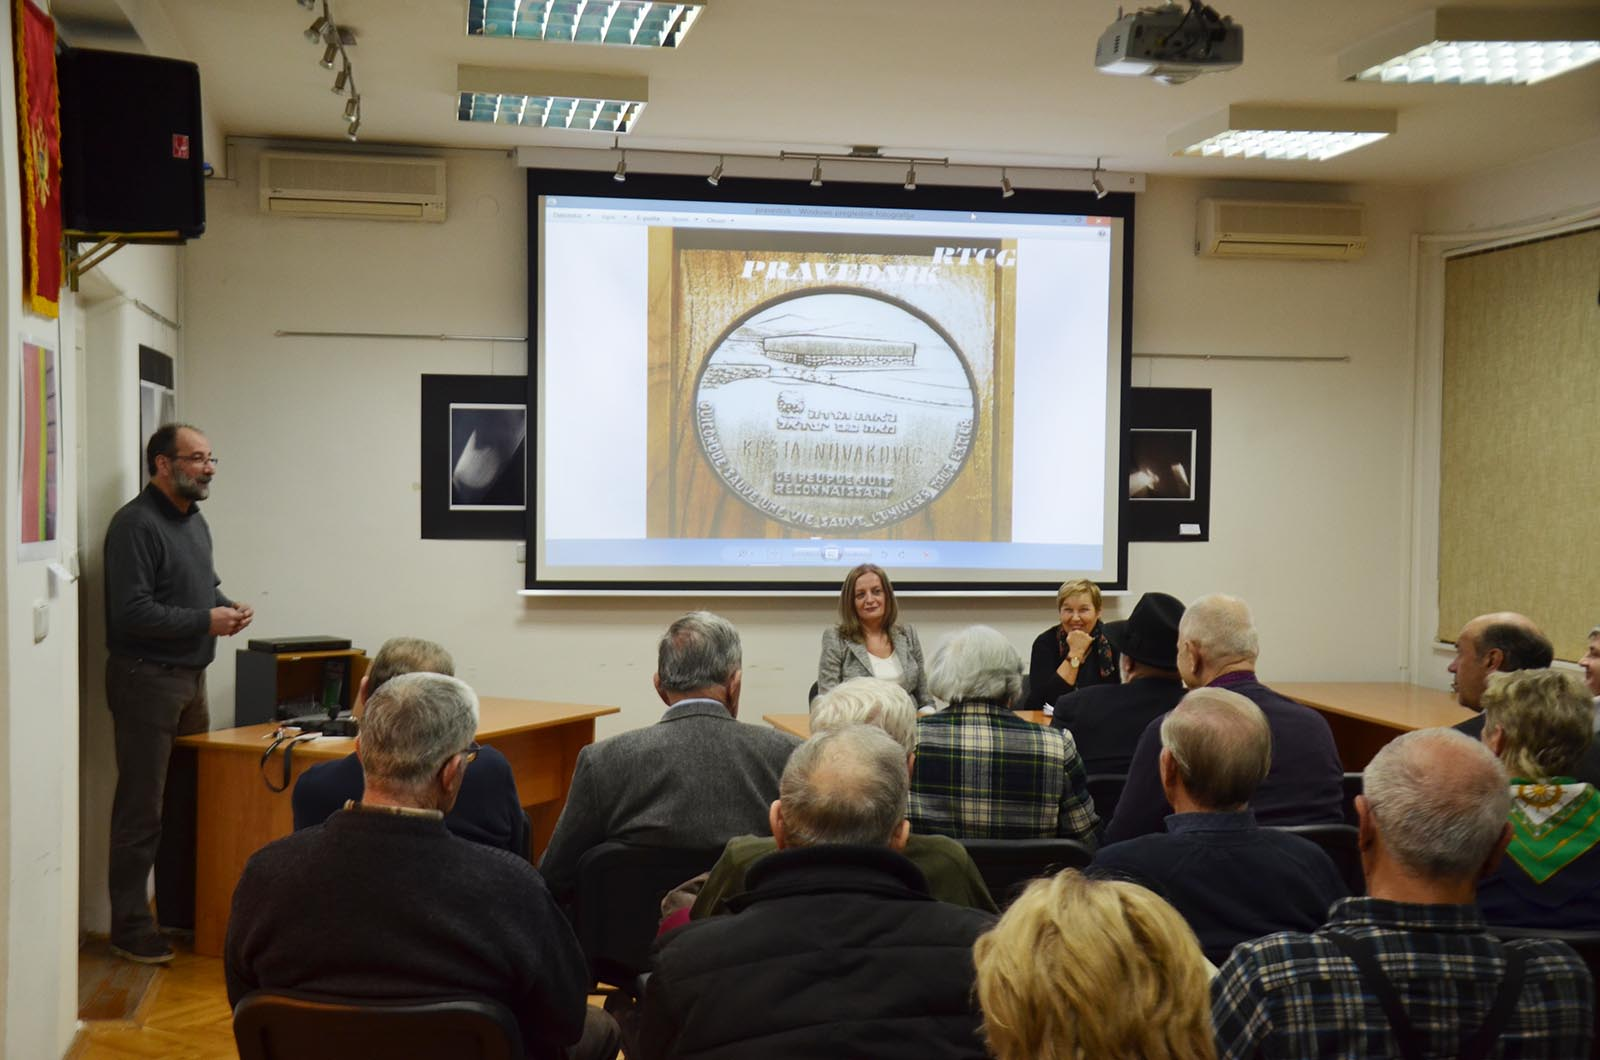 Projekcija Filma U Klubu Crnogoraca (3)